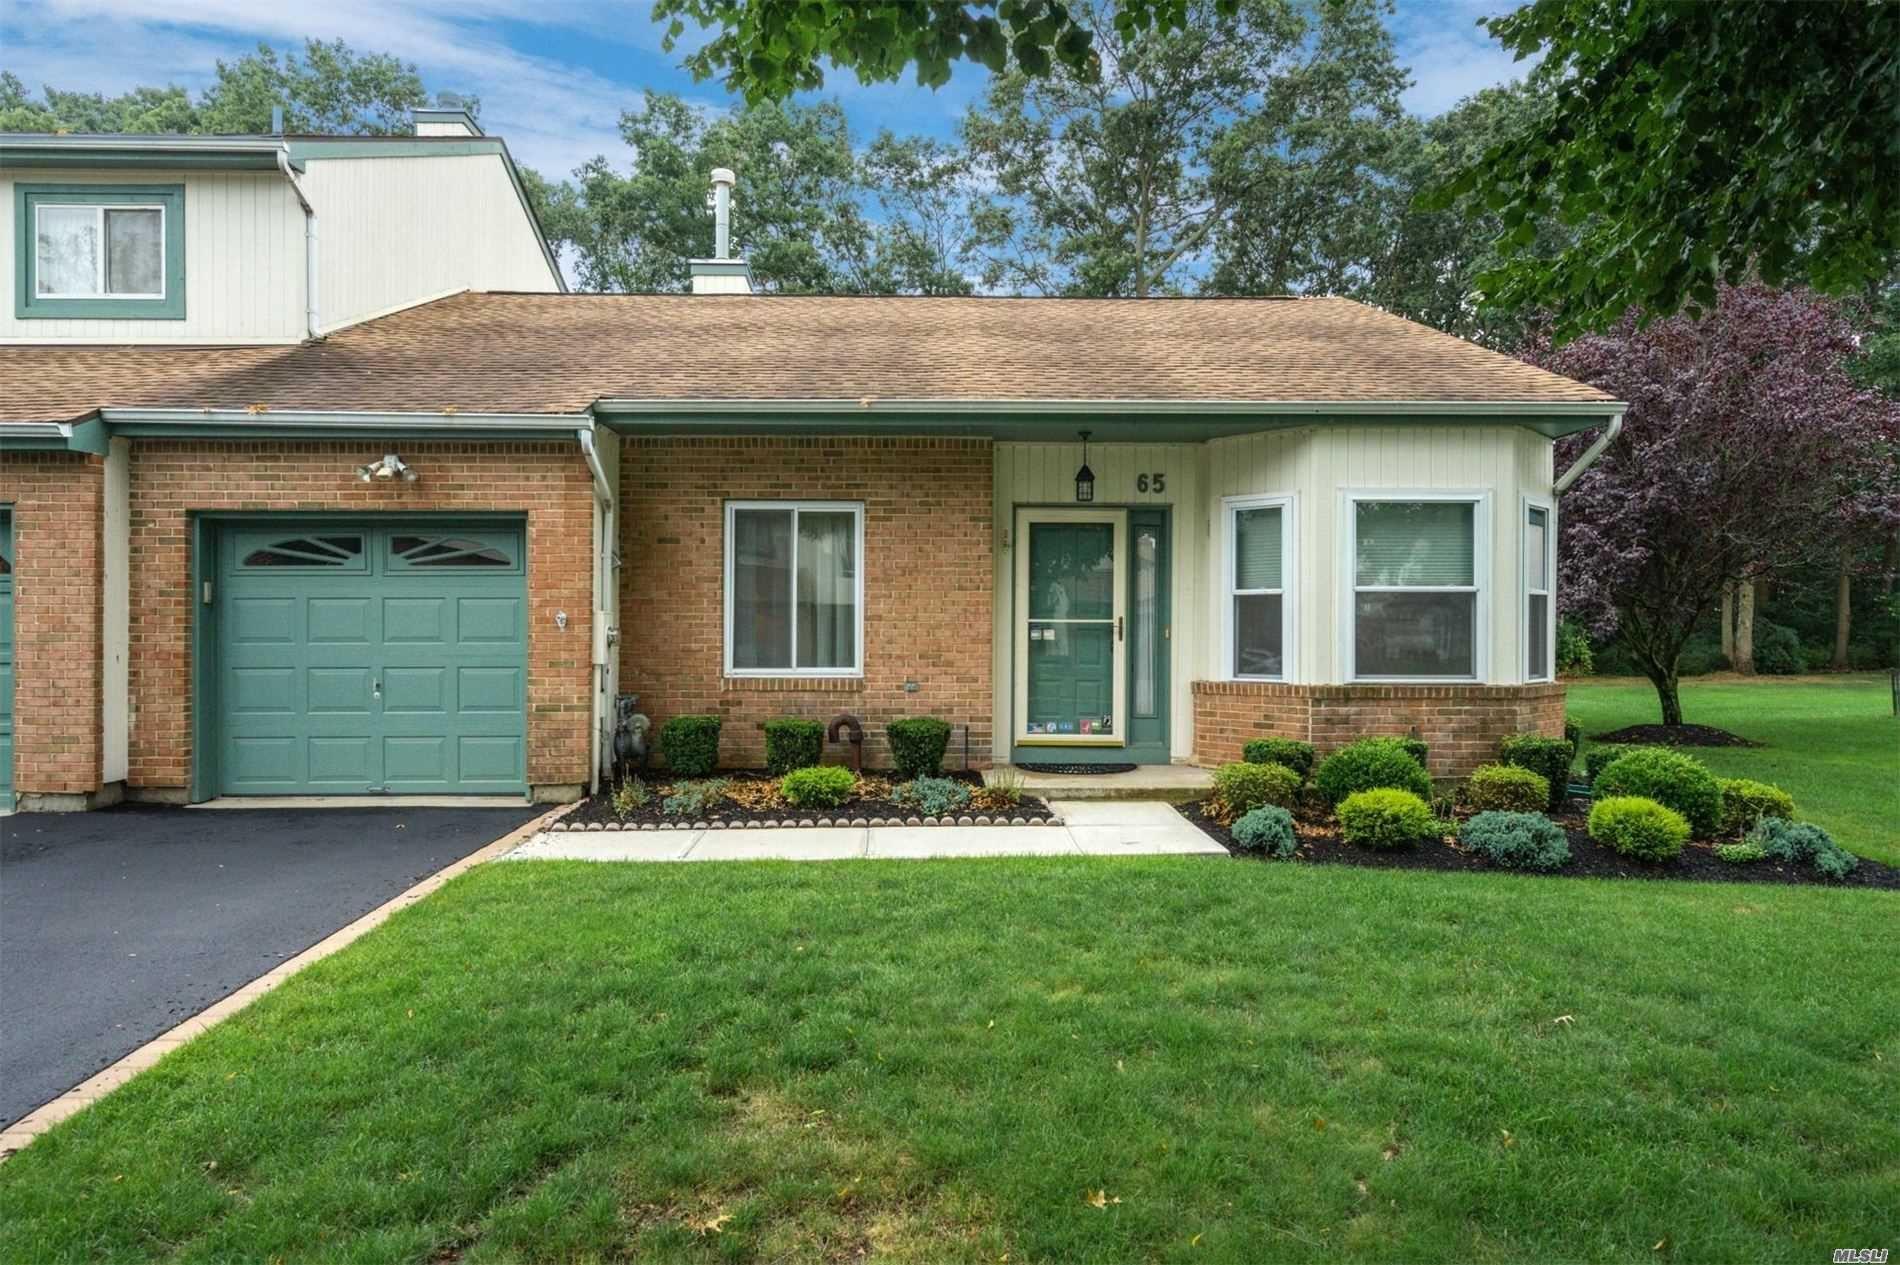 65 Timber Ridge Drive, Holtsville, NY 11742 - MLS#: 3240210